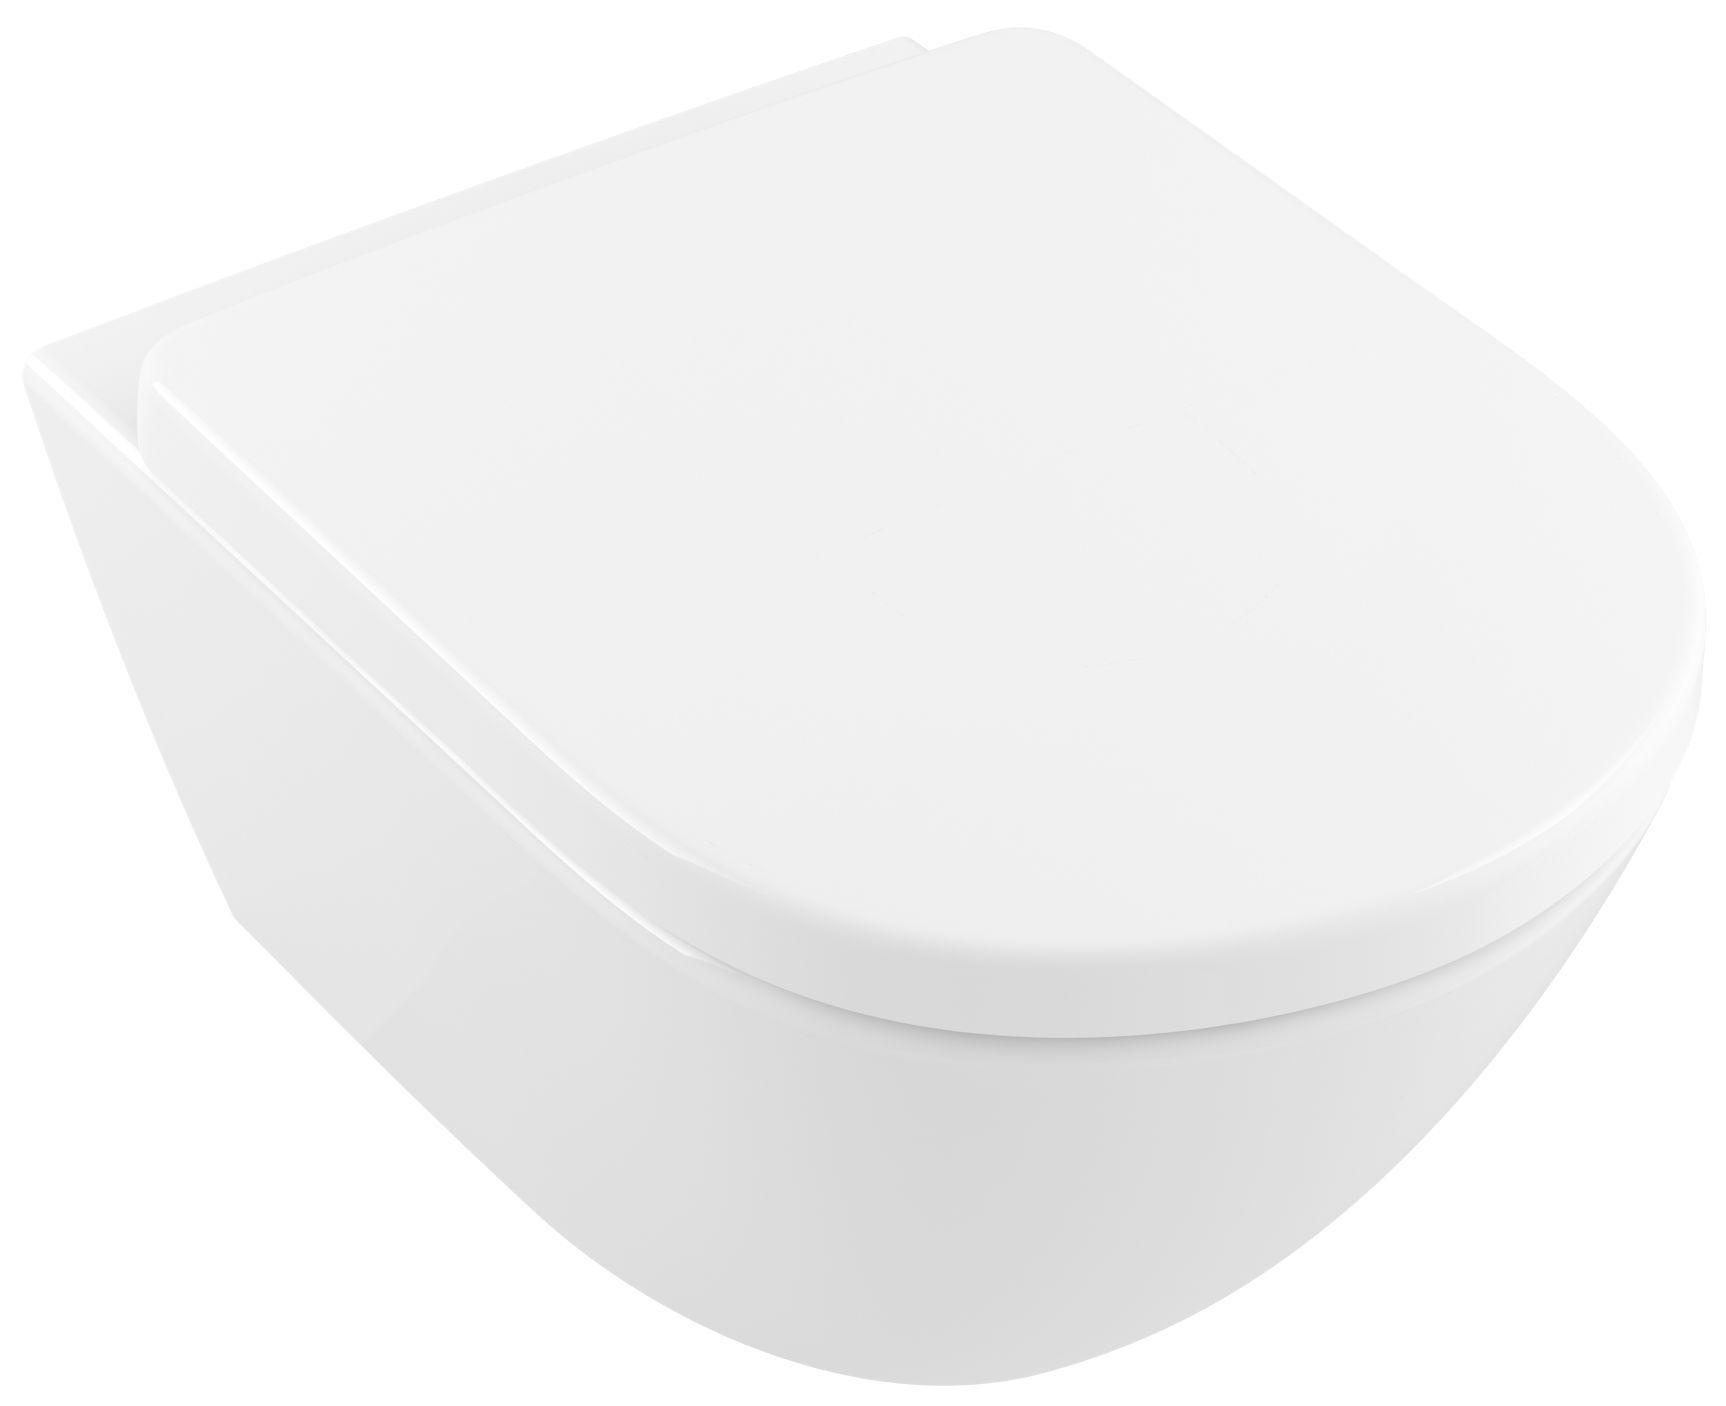 Villeroy & Boch Subway 2.0 Comfort Wand-Tiefspül-WC spülrandlos L:58xB:41cm DirectFlush mit offenem Spülrand weiß mit CeramicPlus 4609R0R1